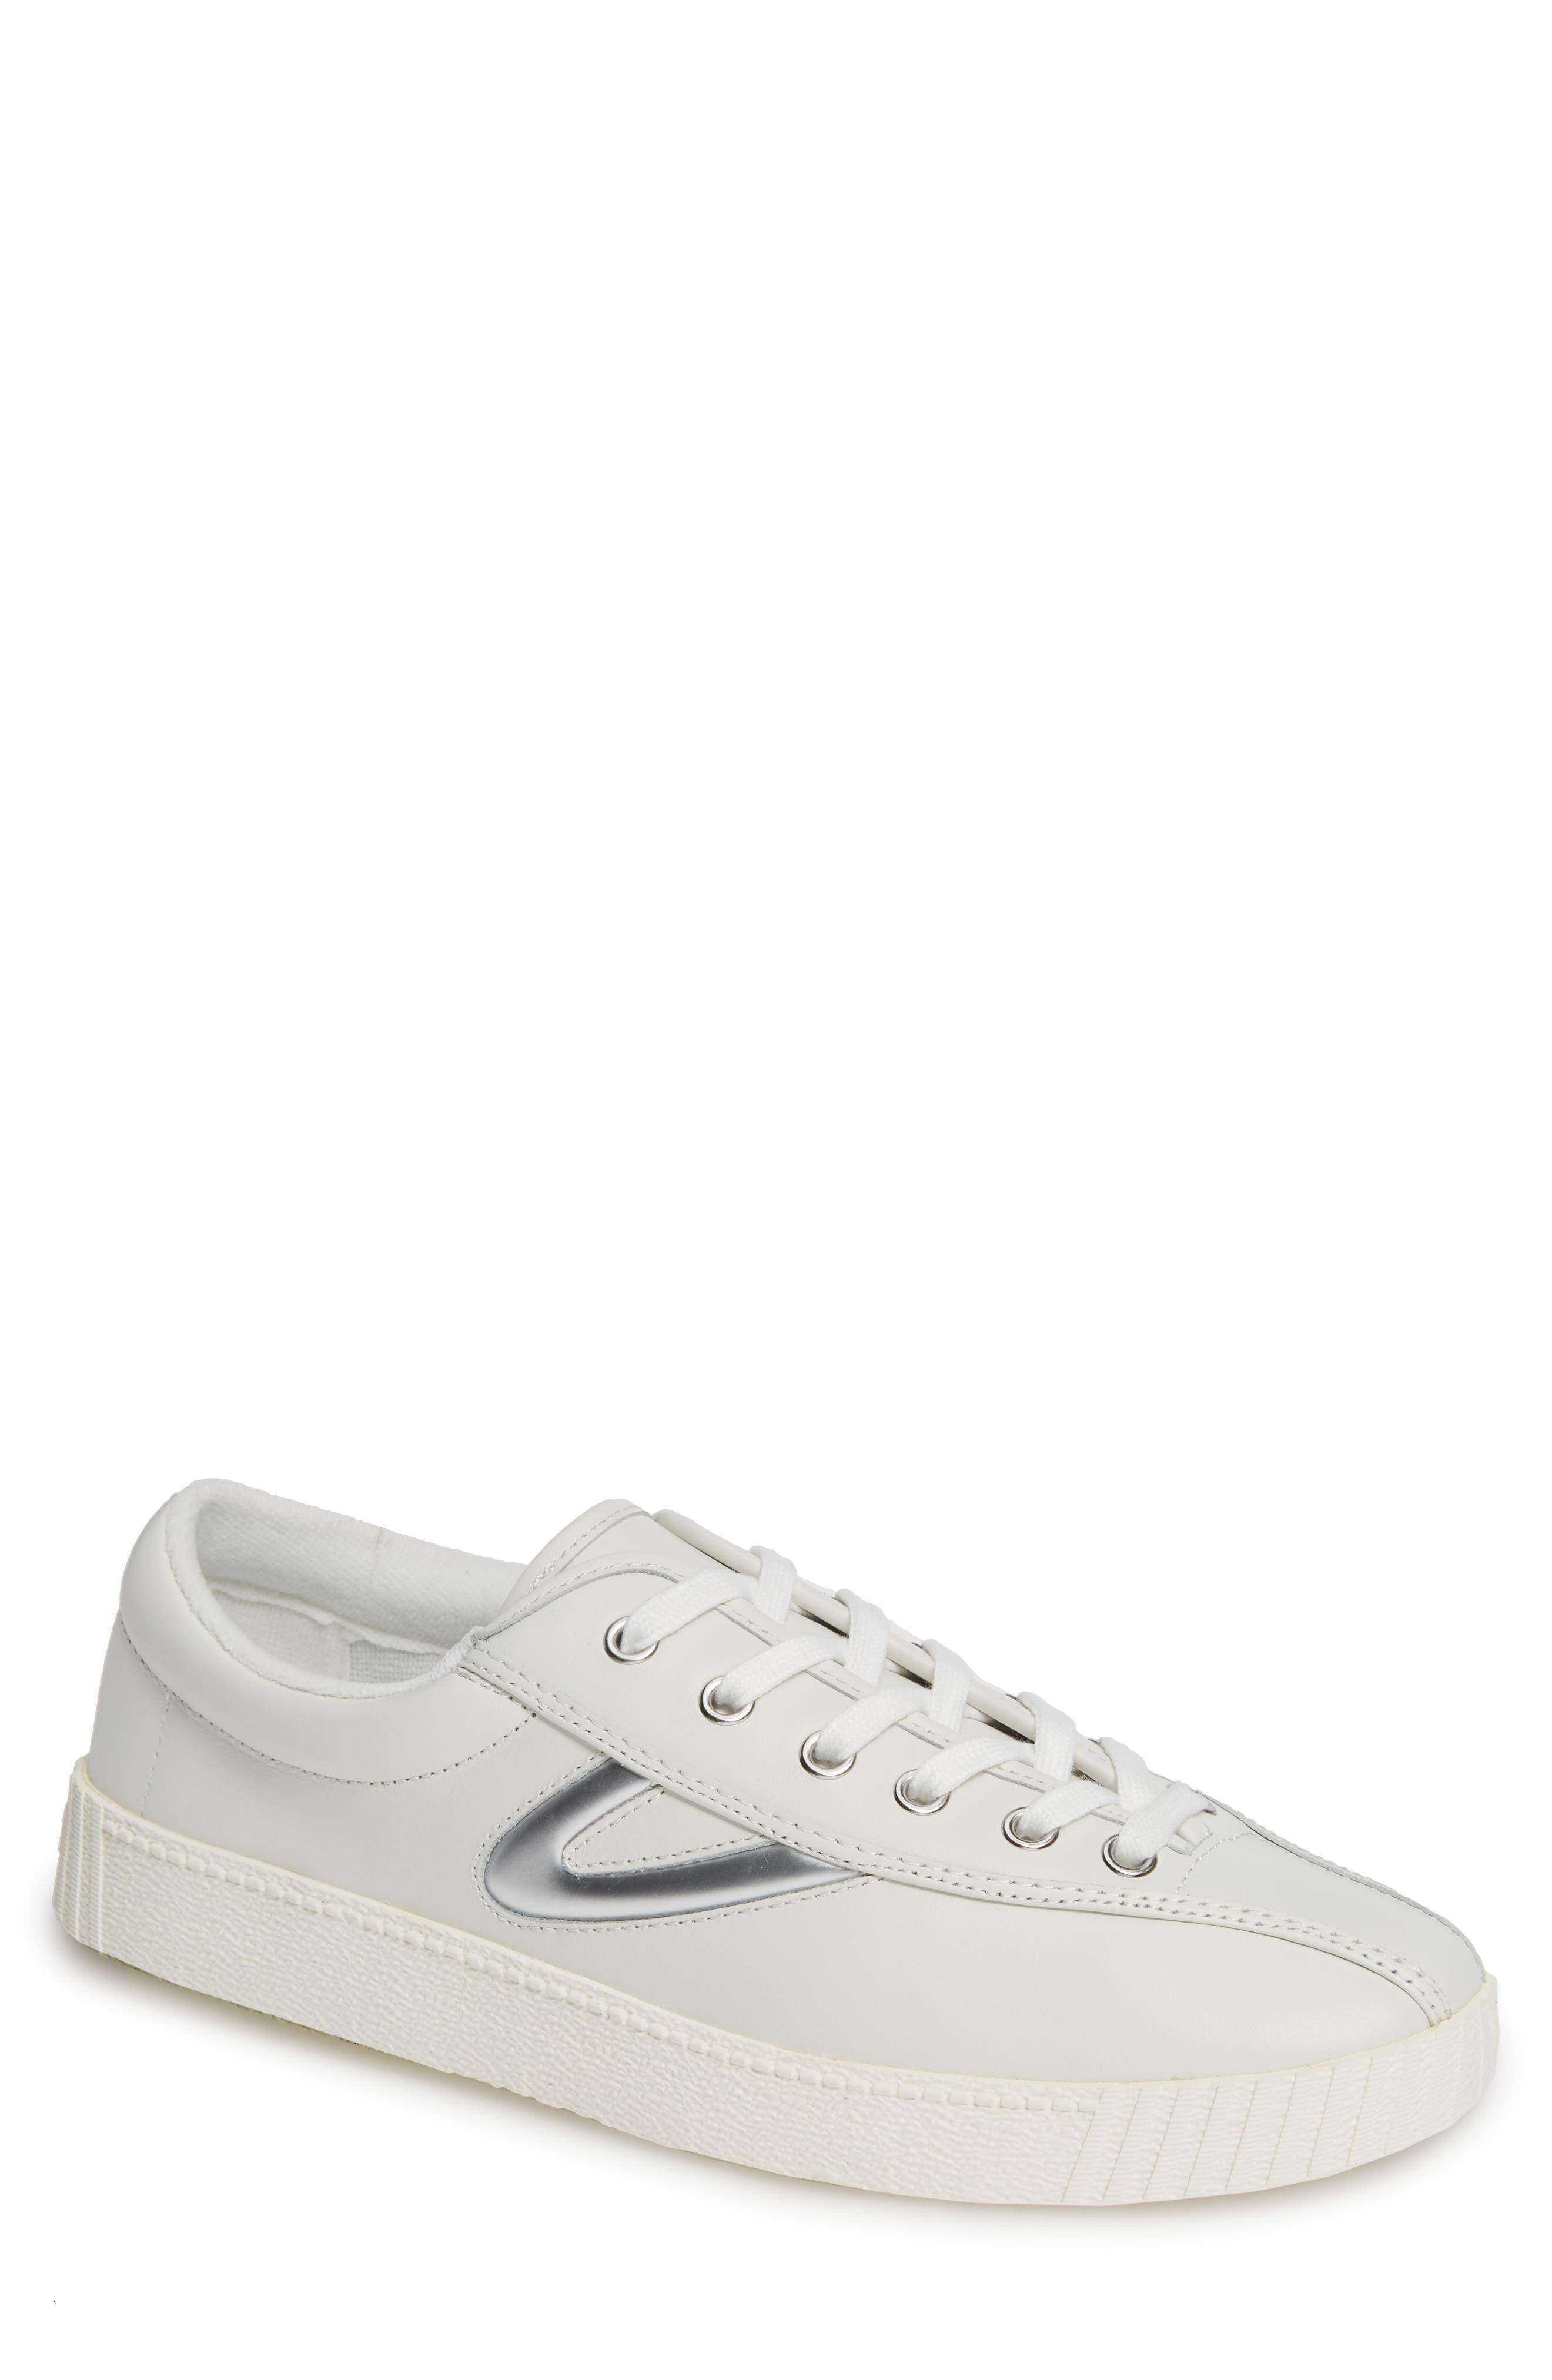 TRETORN Men'S Nylite 29 Plus Leather Sneakers in White